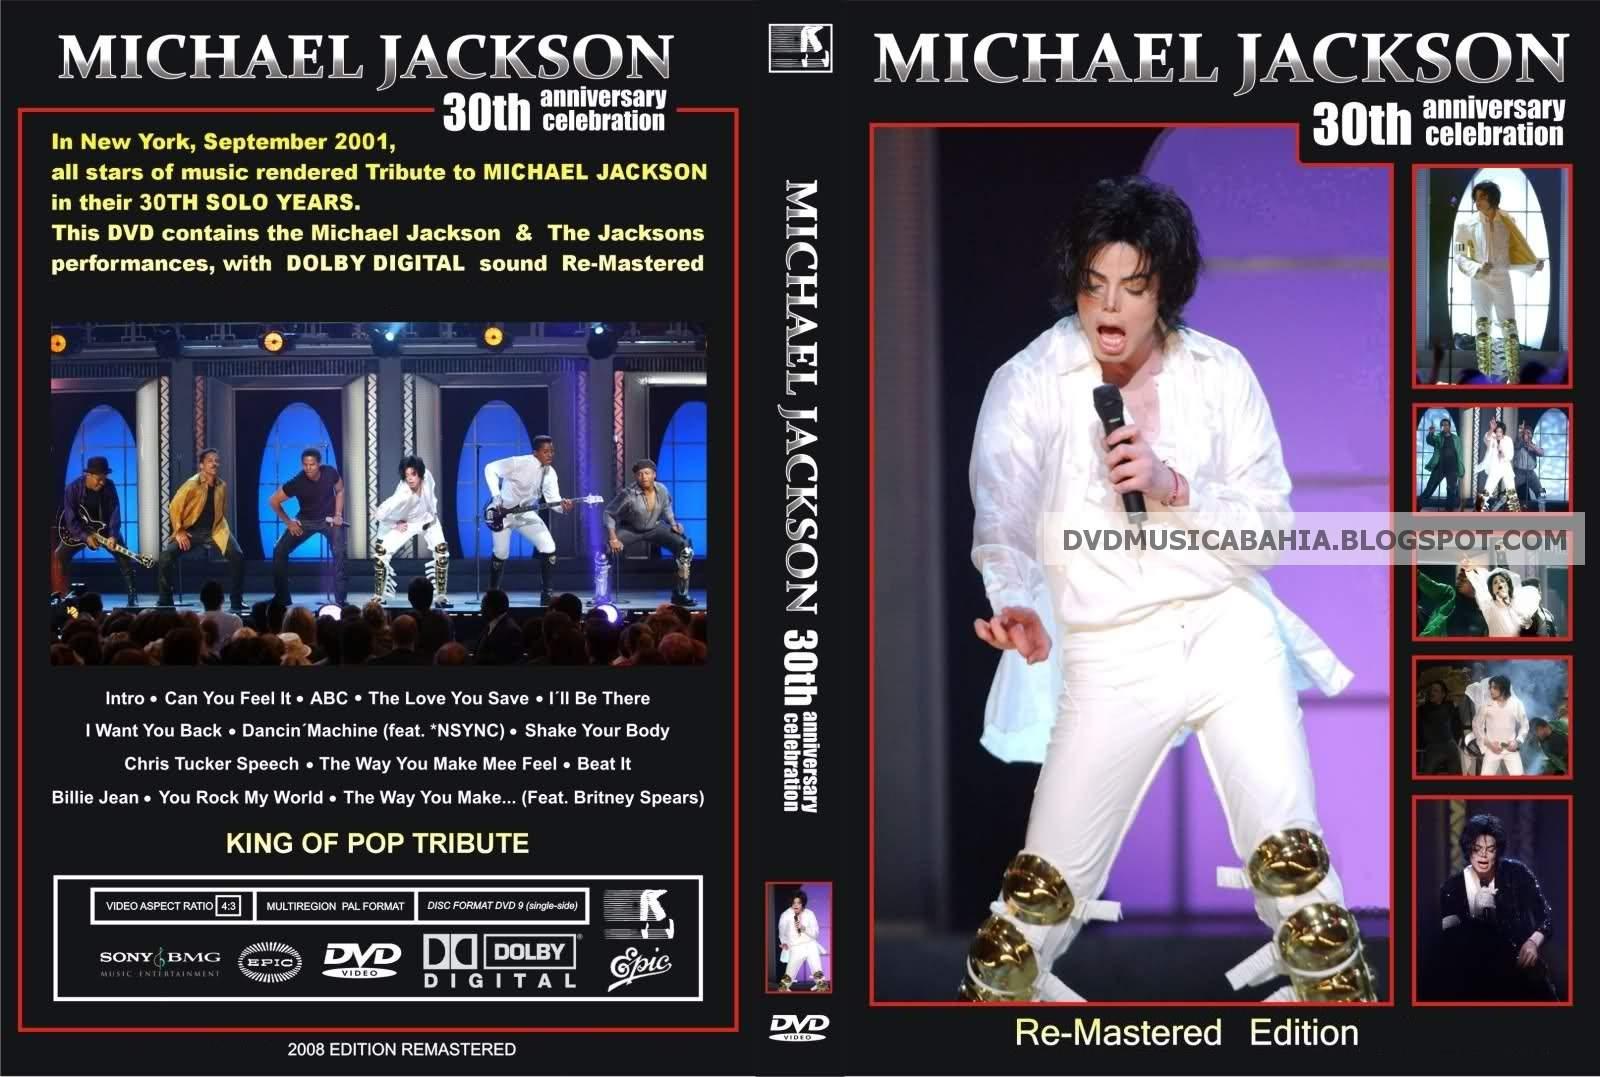 http://2.bp.blogspot.com/-mEmaoPmWuJA/ThdwnXguiSI/AAAAAAAABrQ/wCpz-VDxR6c/s1600/MICHAEL+JACSON+-+30+ANIVERSARIO+CONCERT.jpg